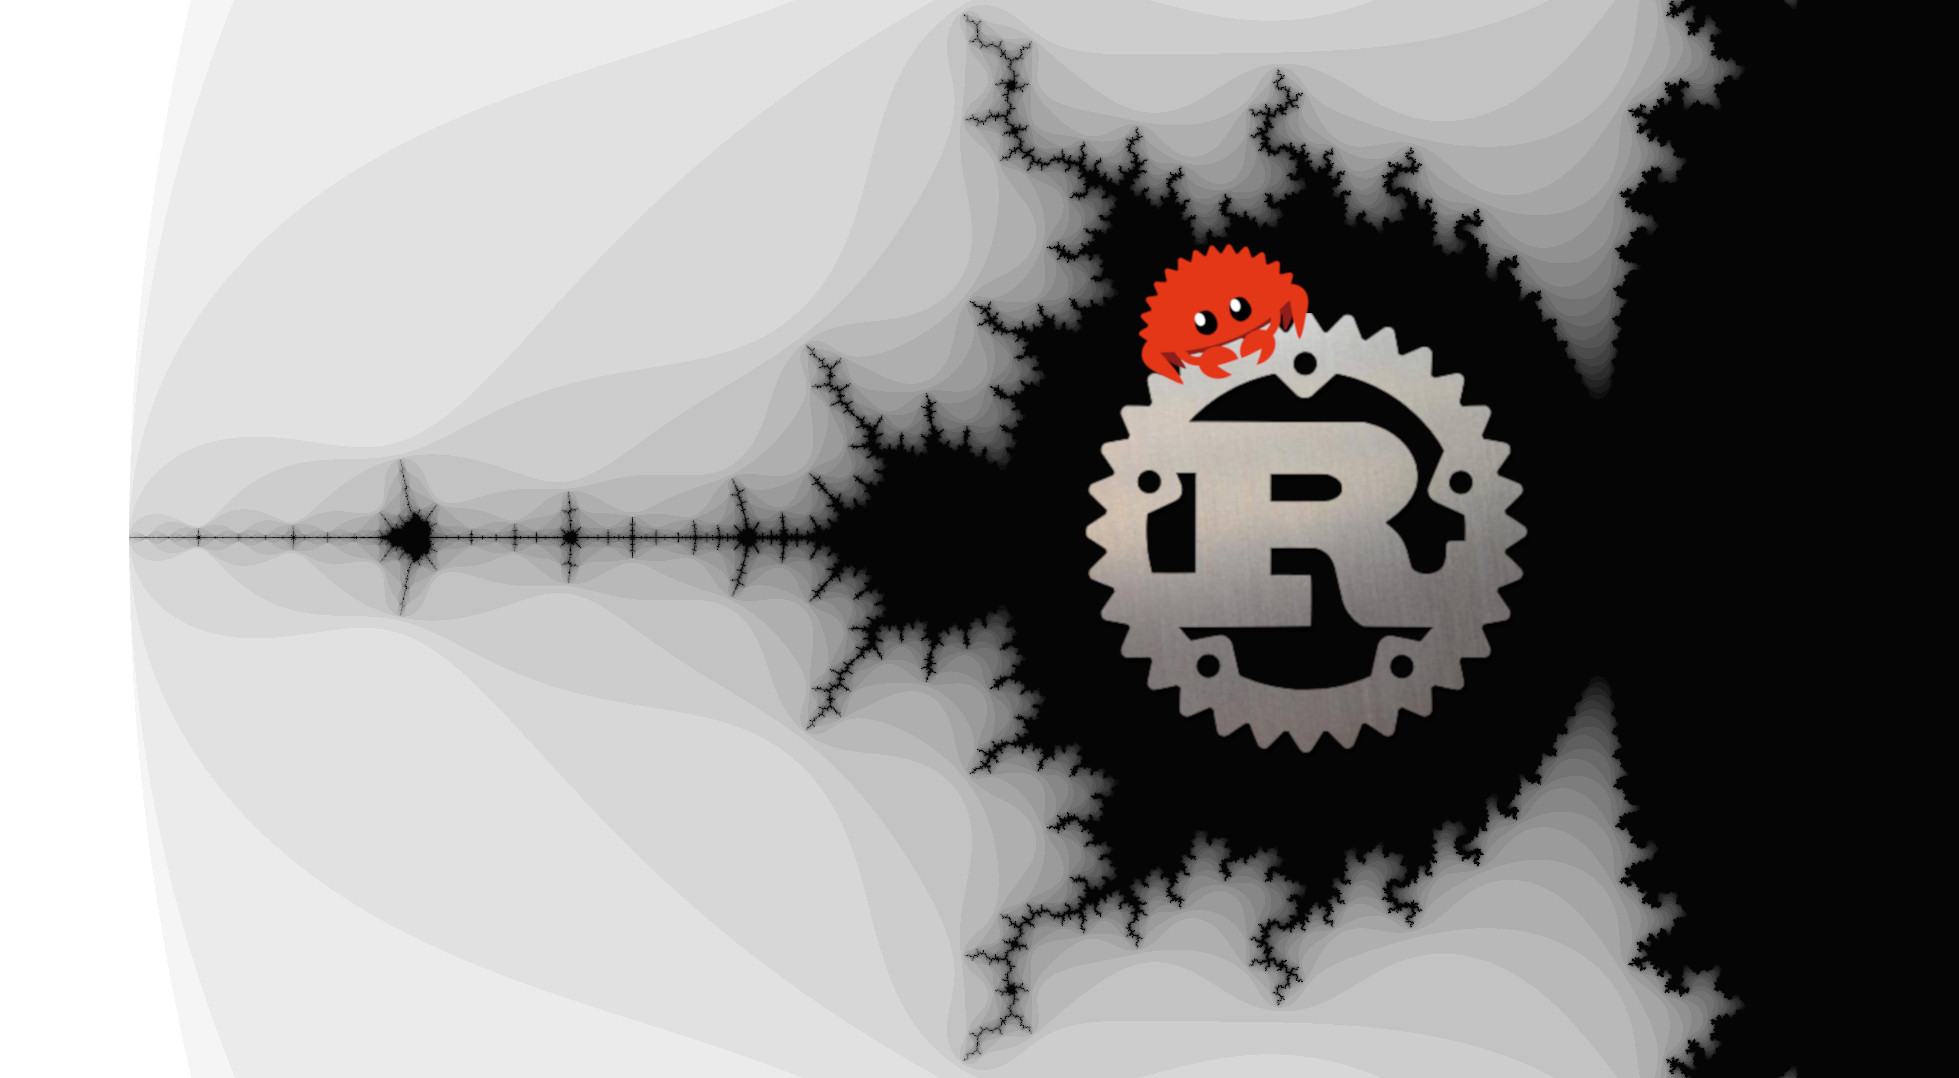 Rusty Mandelbrot